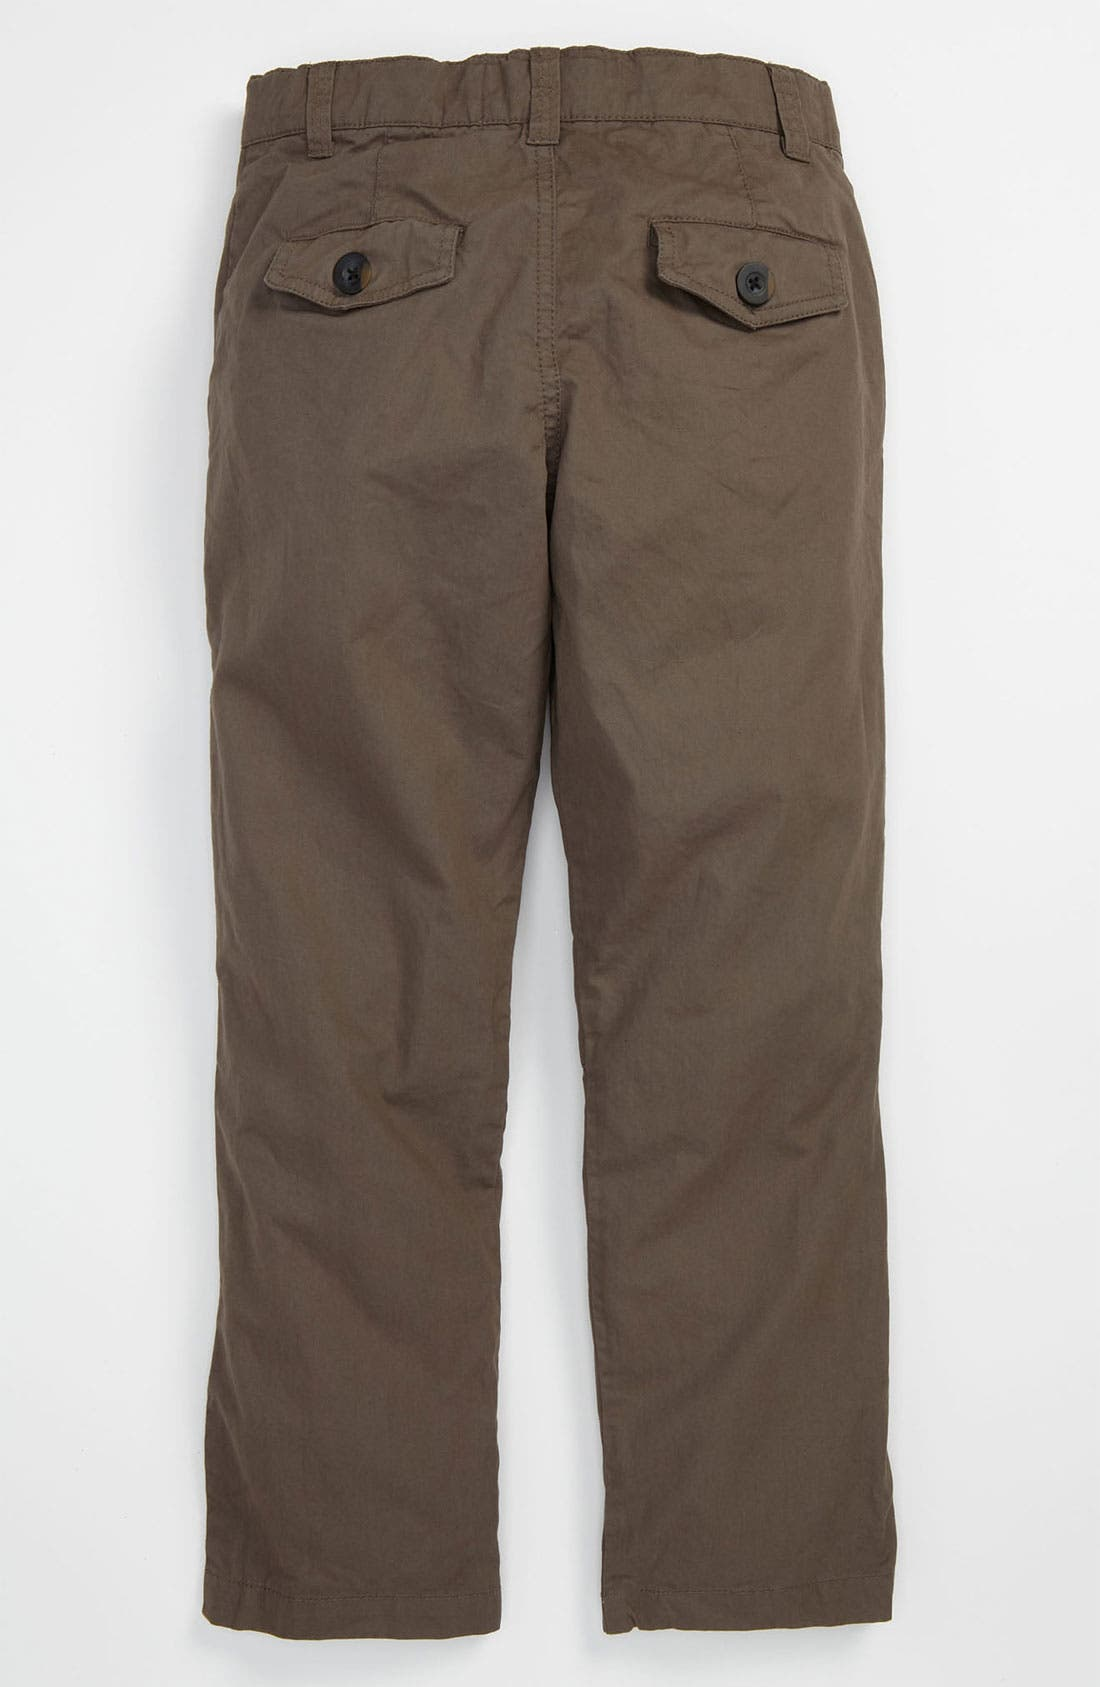 Alternate Image 1 Selected - Peek 'Austin' Pants (Big Boys)